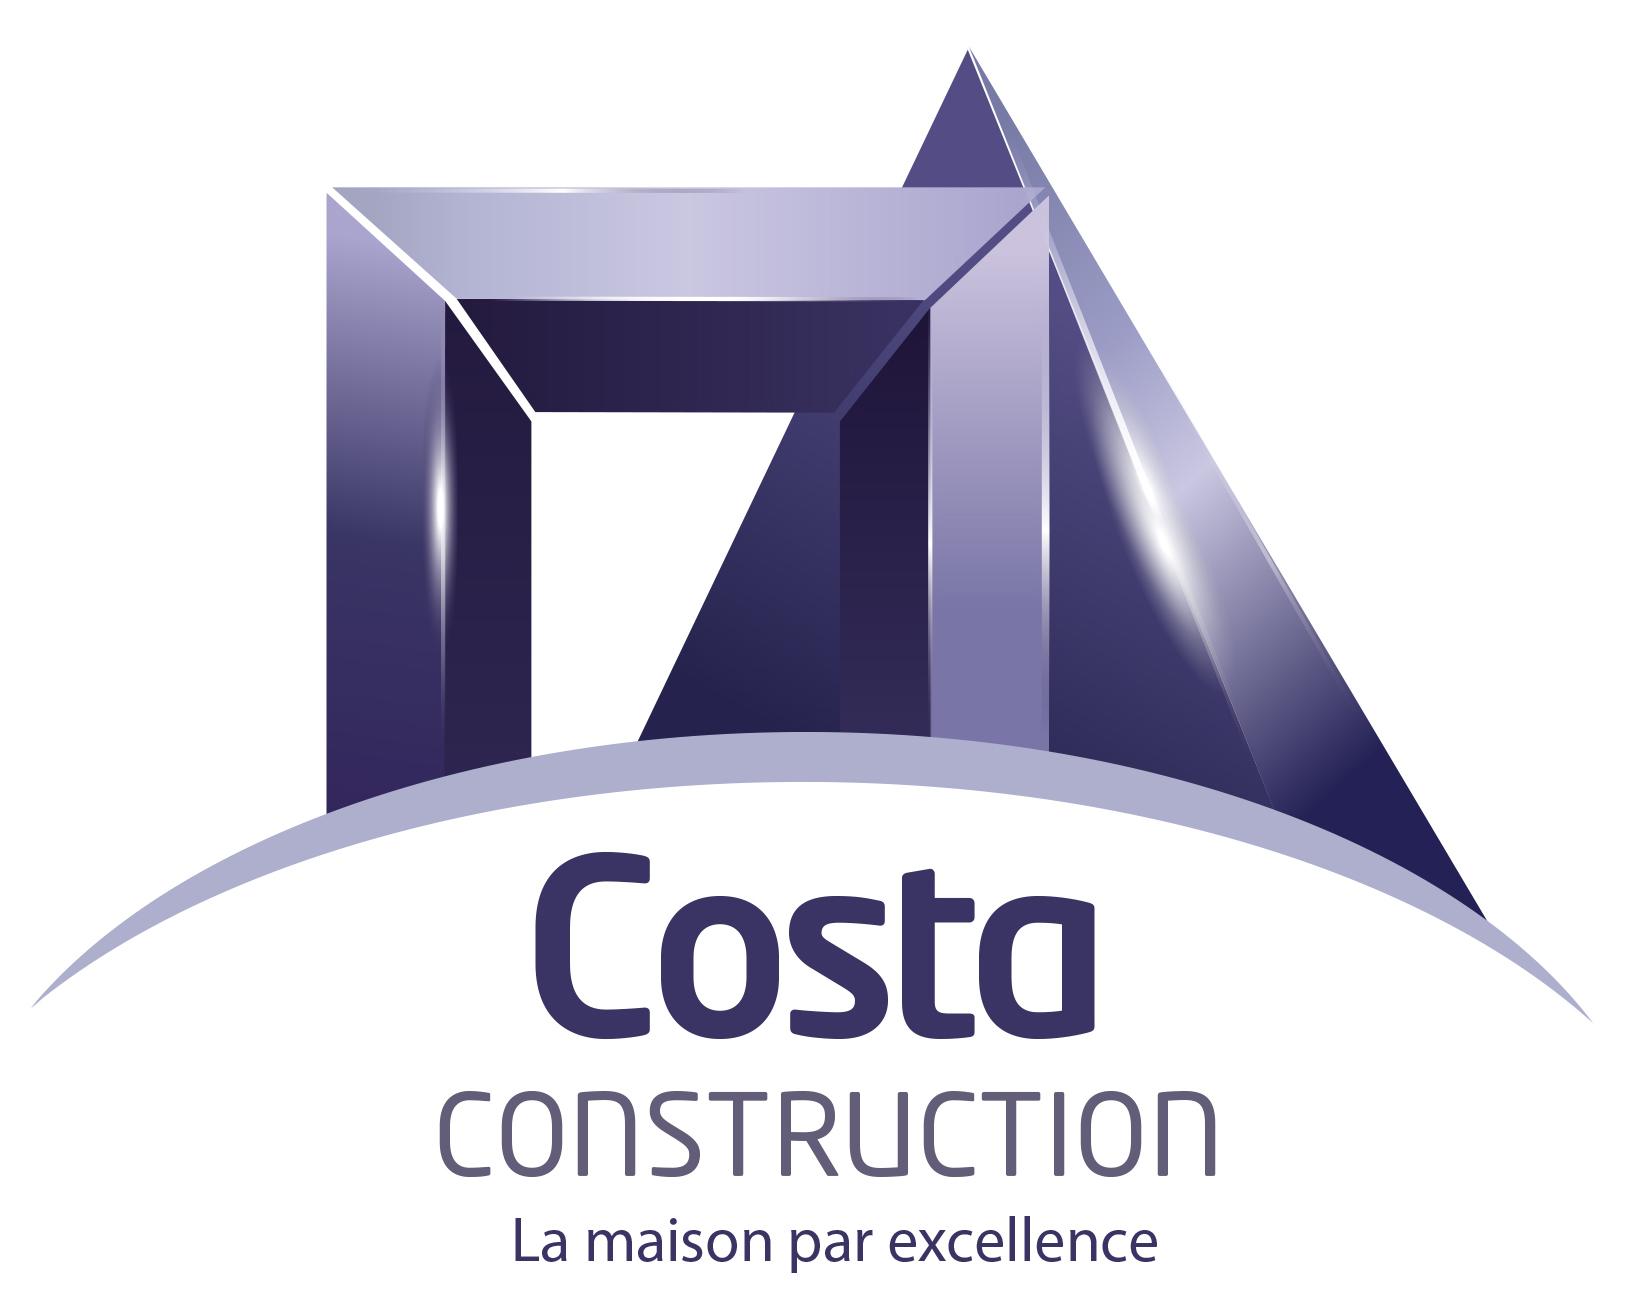 Costa Construction